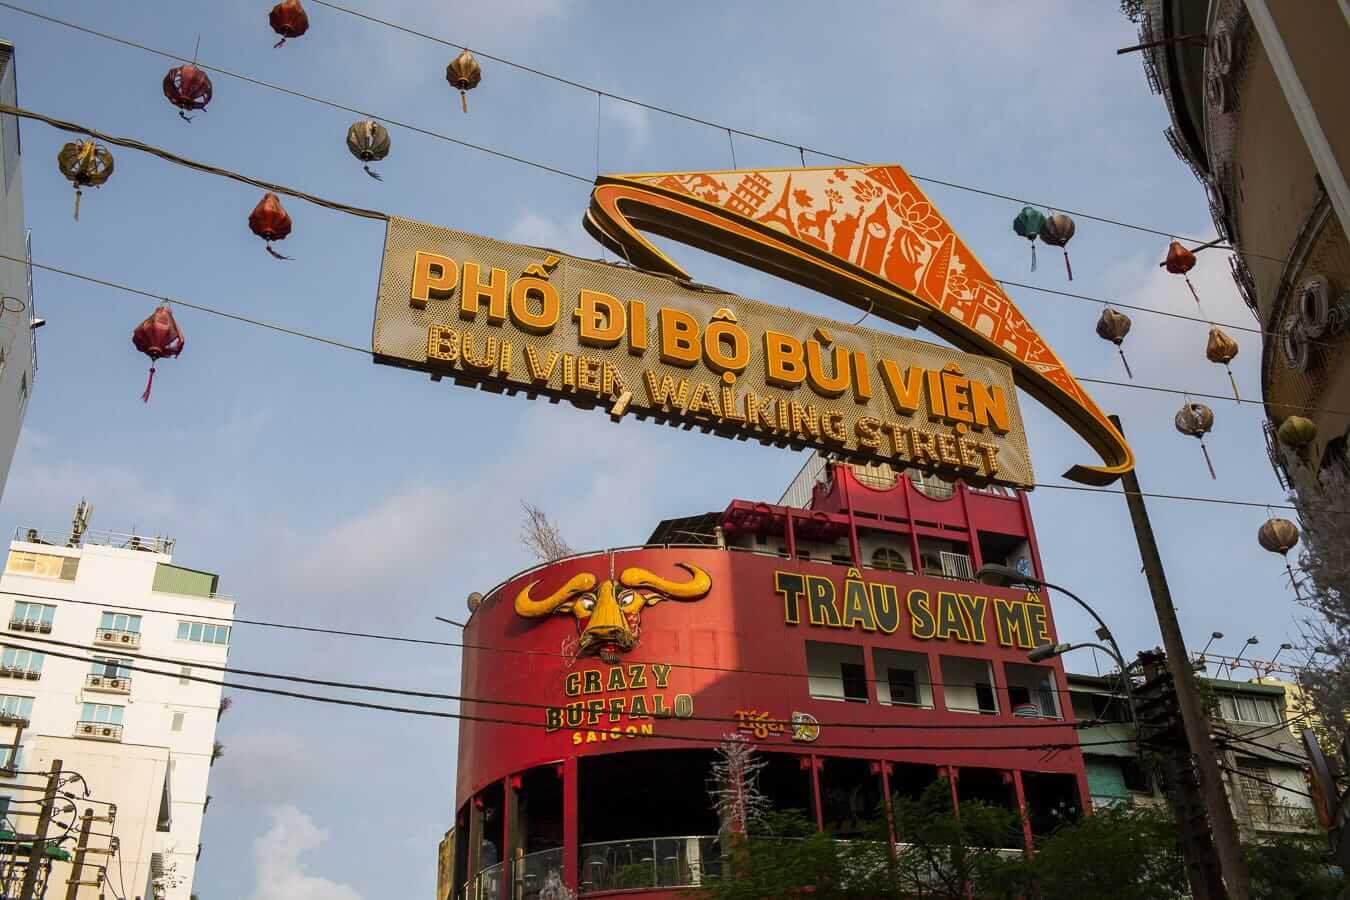 Bui Vien street: Ho Chi Minh to Hoi An